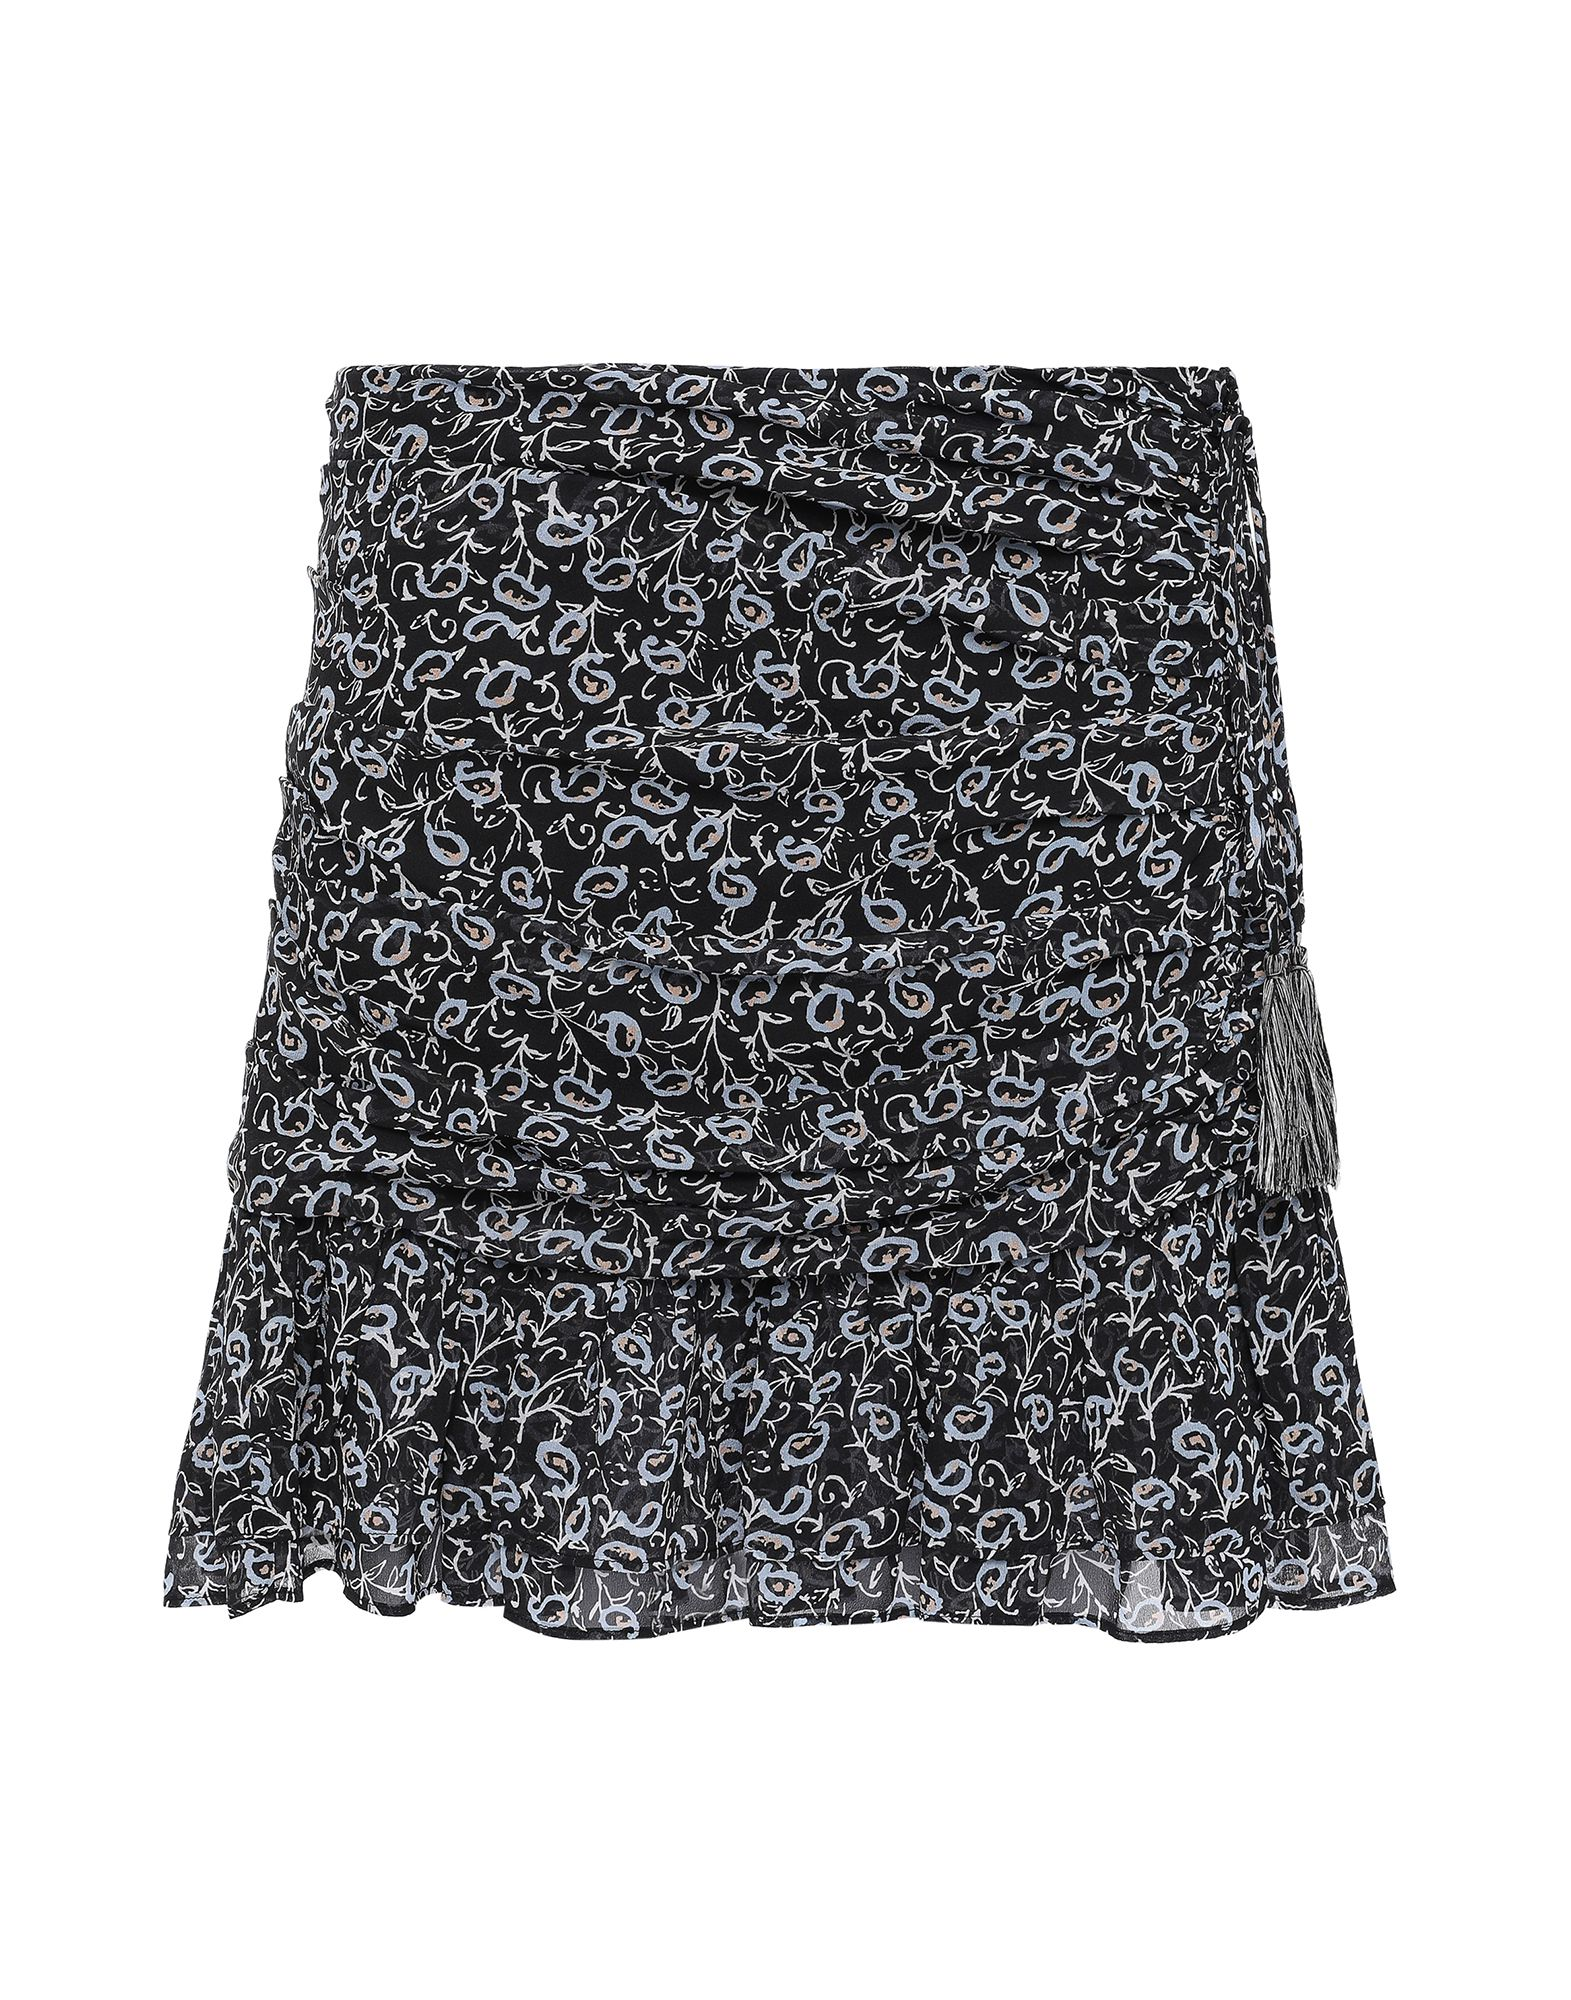 VERONICA BEARD Mini skirts. crepe, tassels, frills, floral design, side closure, hook-and-bar, zip, fully lined. 100% Silk